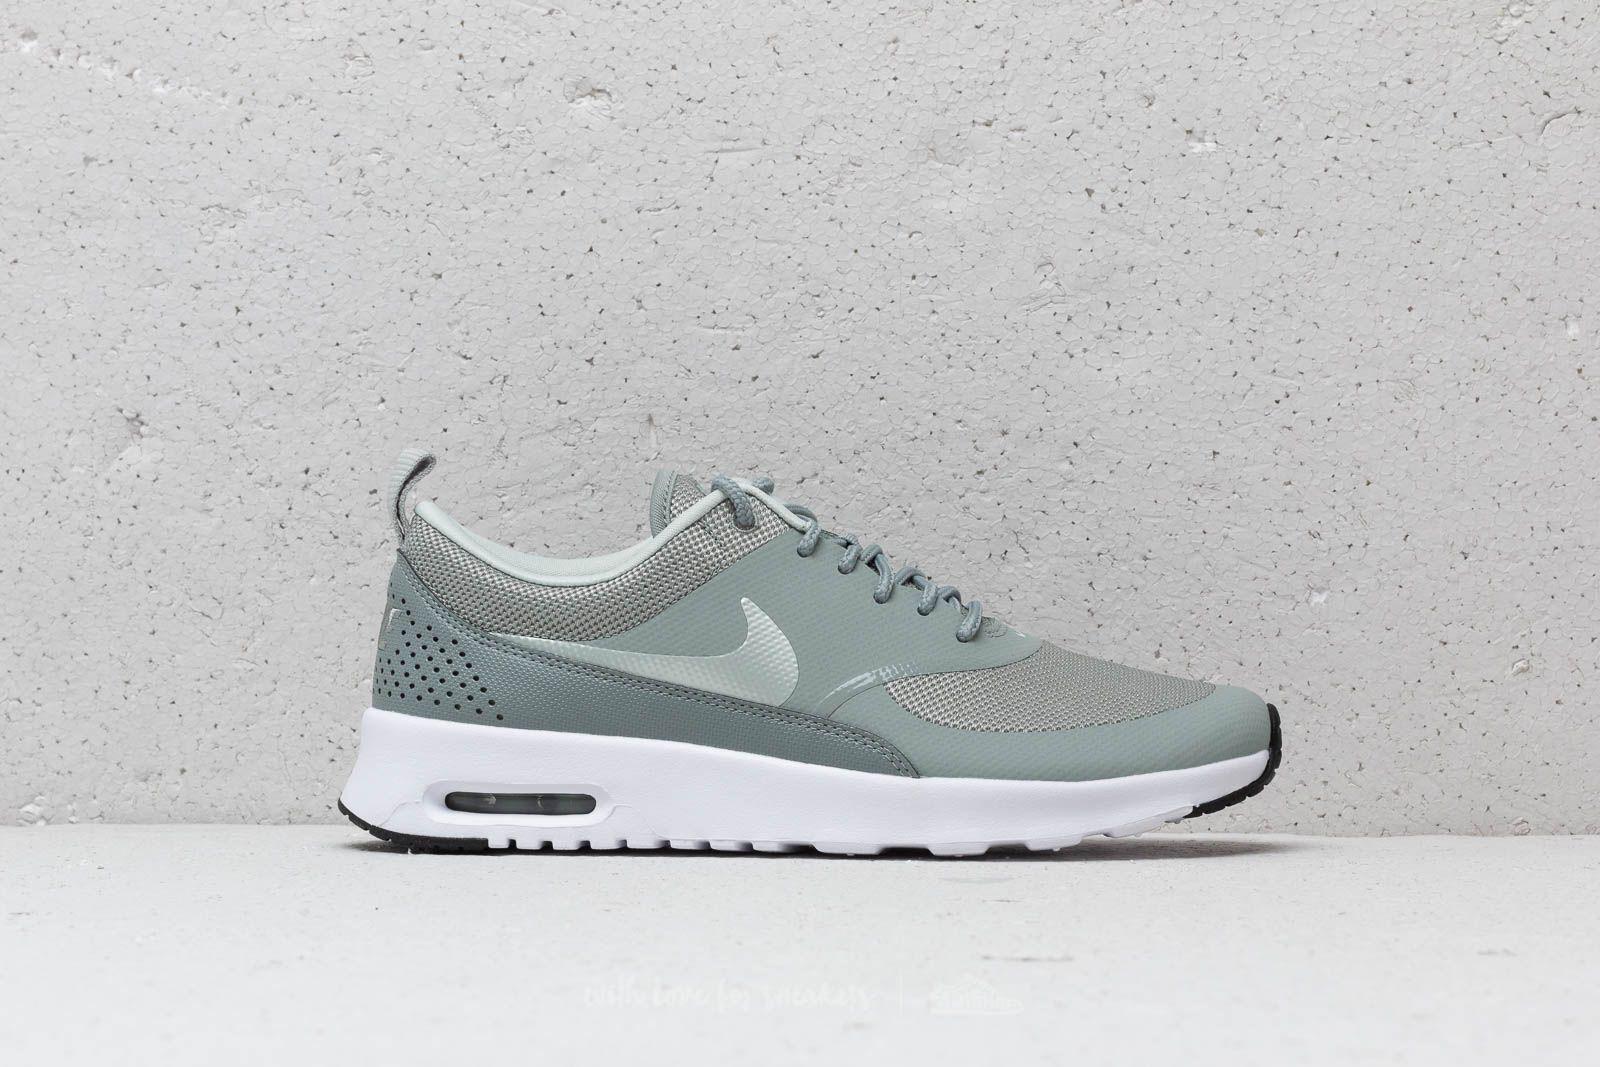 Nike Rubber Wmns Air Max Thea Mica Green Light Silver black